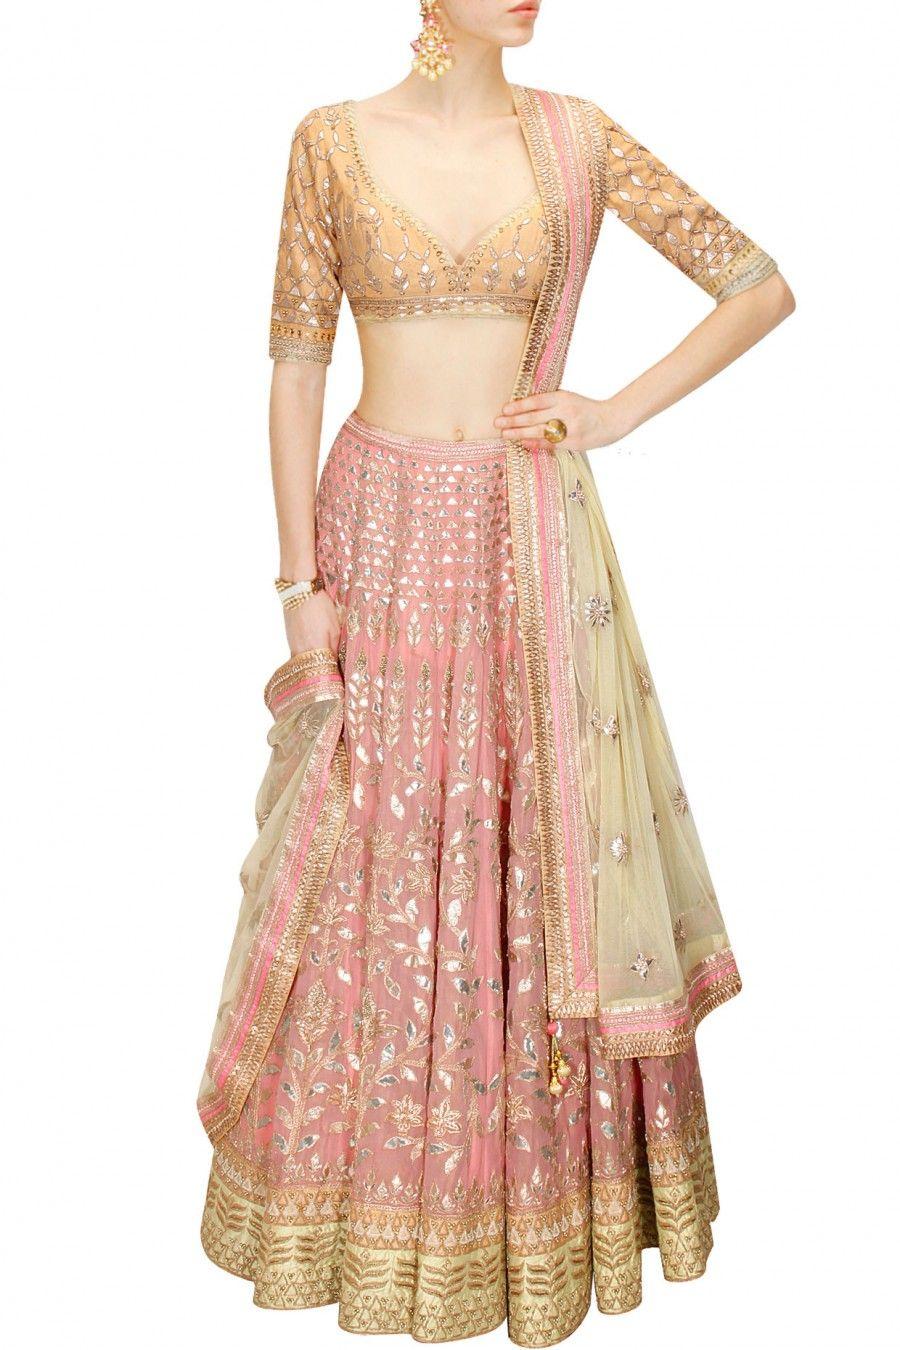 ANITA DONGRE - Blush pink gota patti embroidered lehenga ...